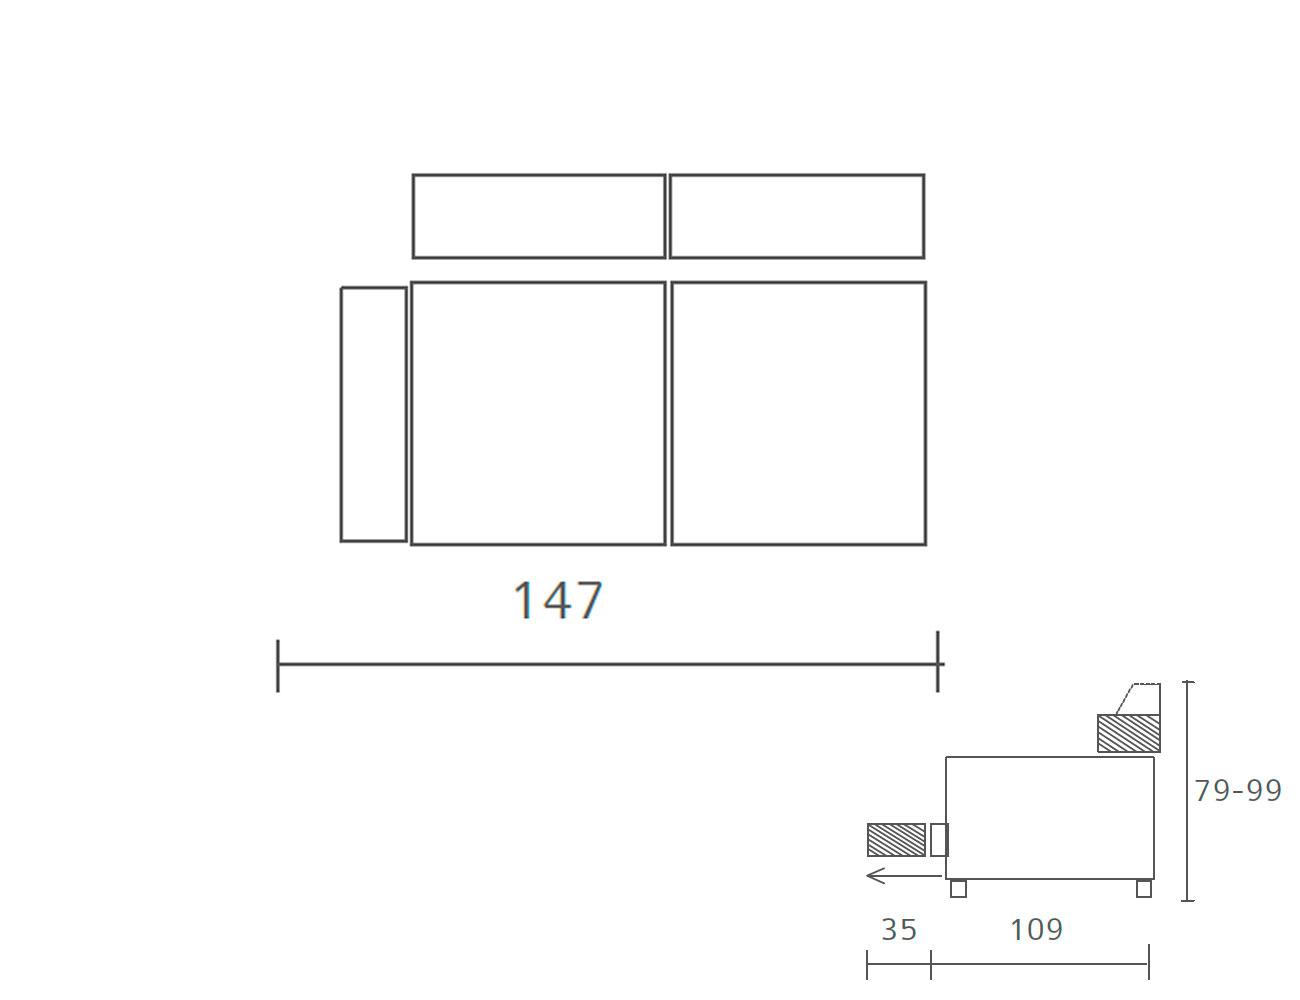 Sofa piel 2 plazas 1472